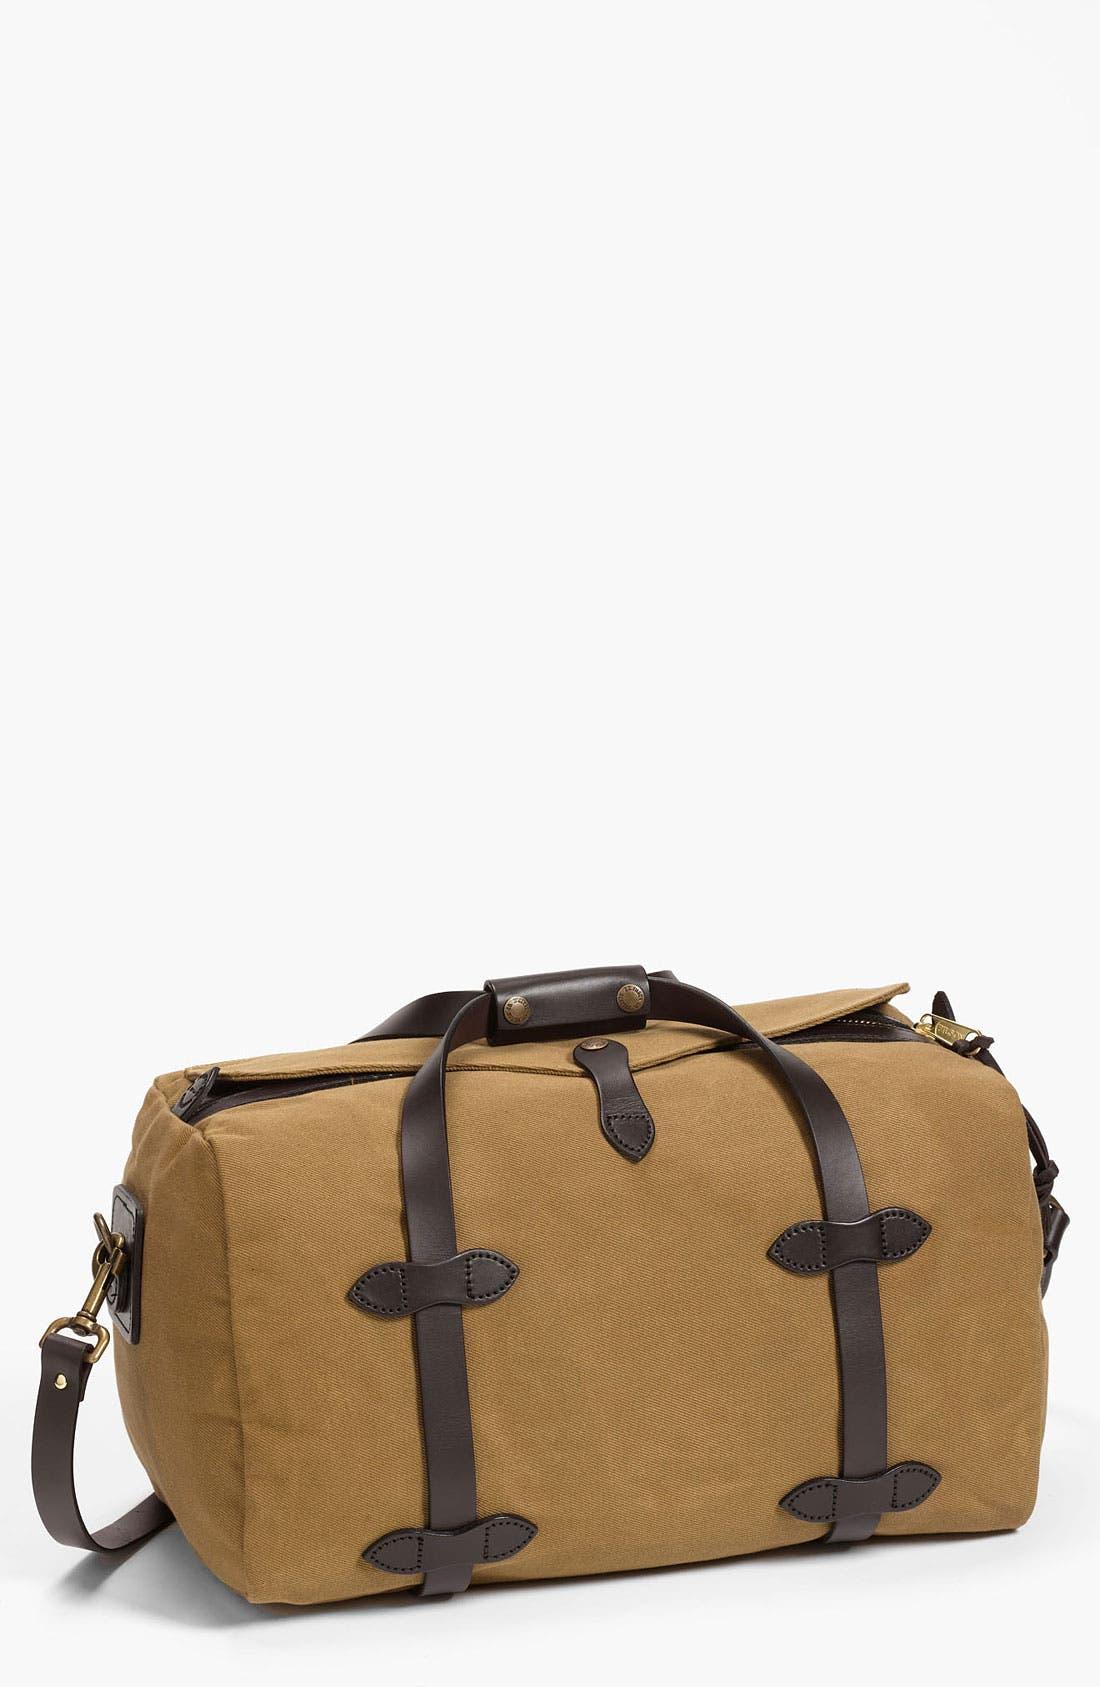 Main Image - Filson Small Duffel Bag